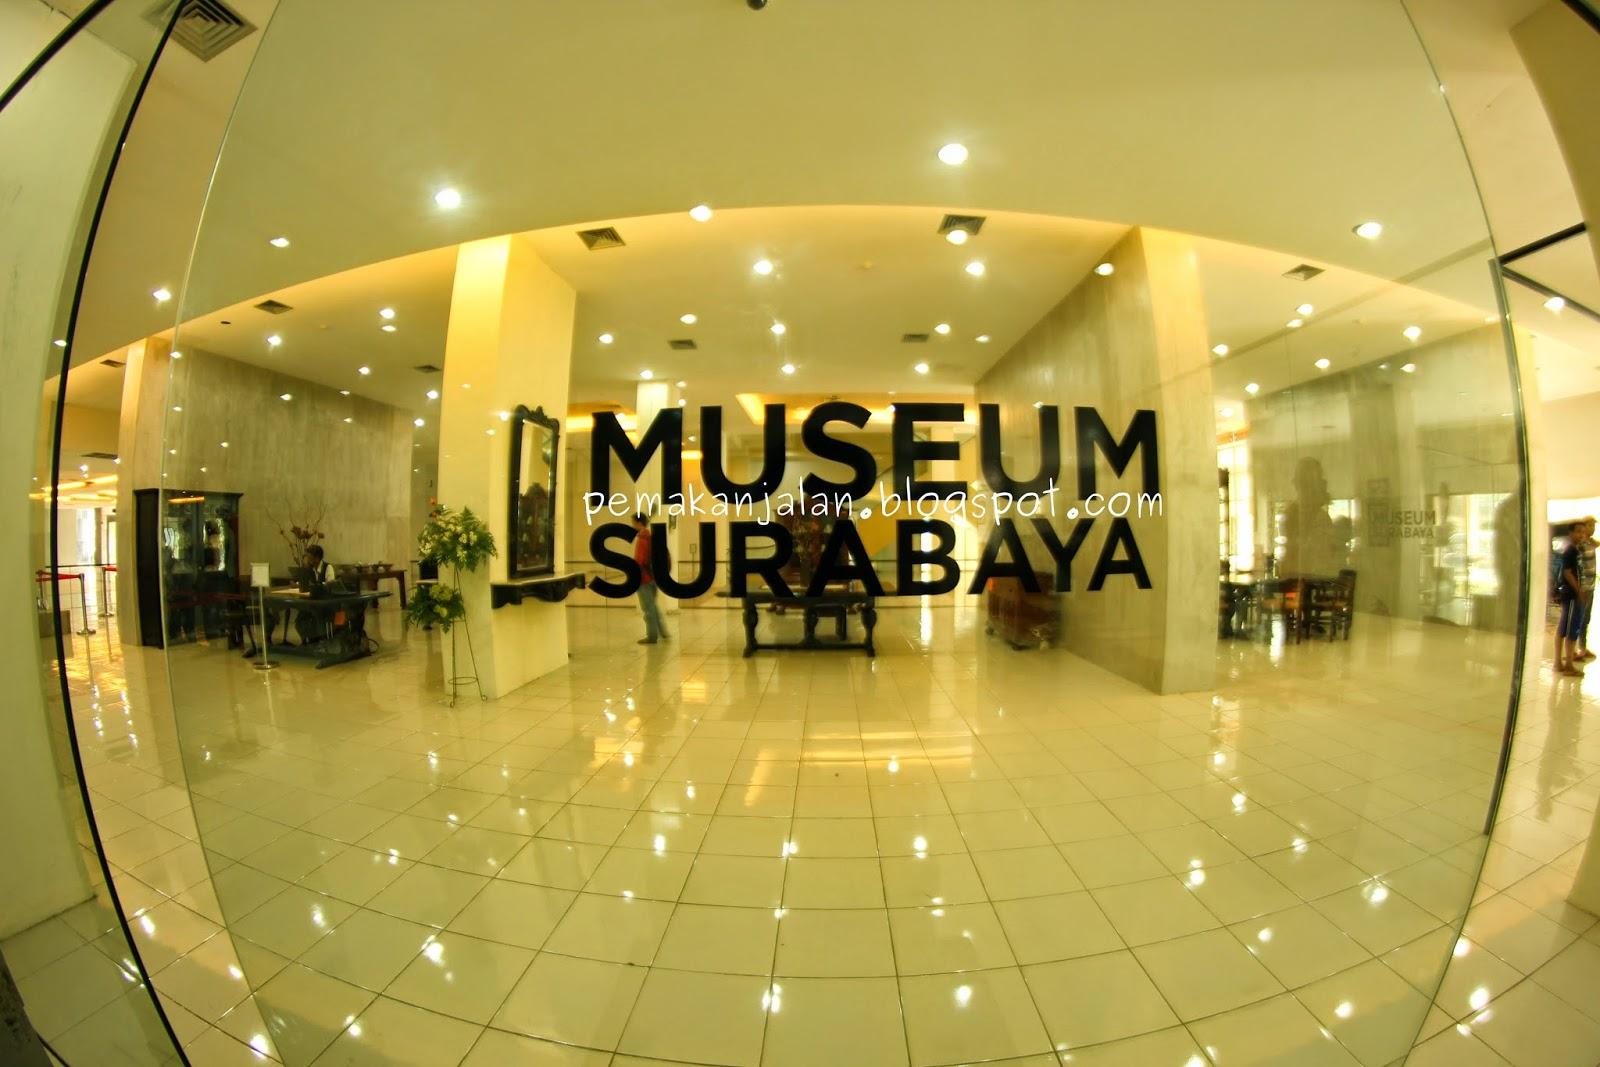 Alternatif Wisata Museum Surabaya Pemakan Jalan Gambar 2 Sebuah Kaca